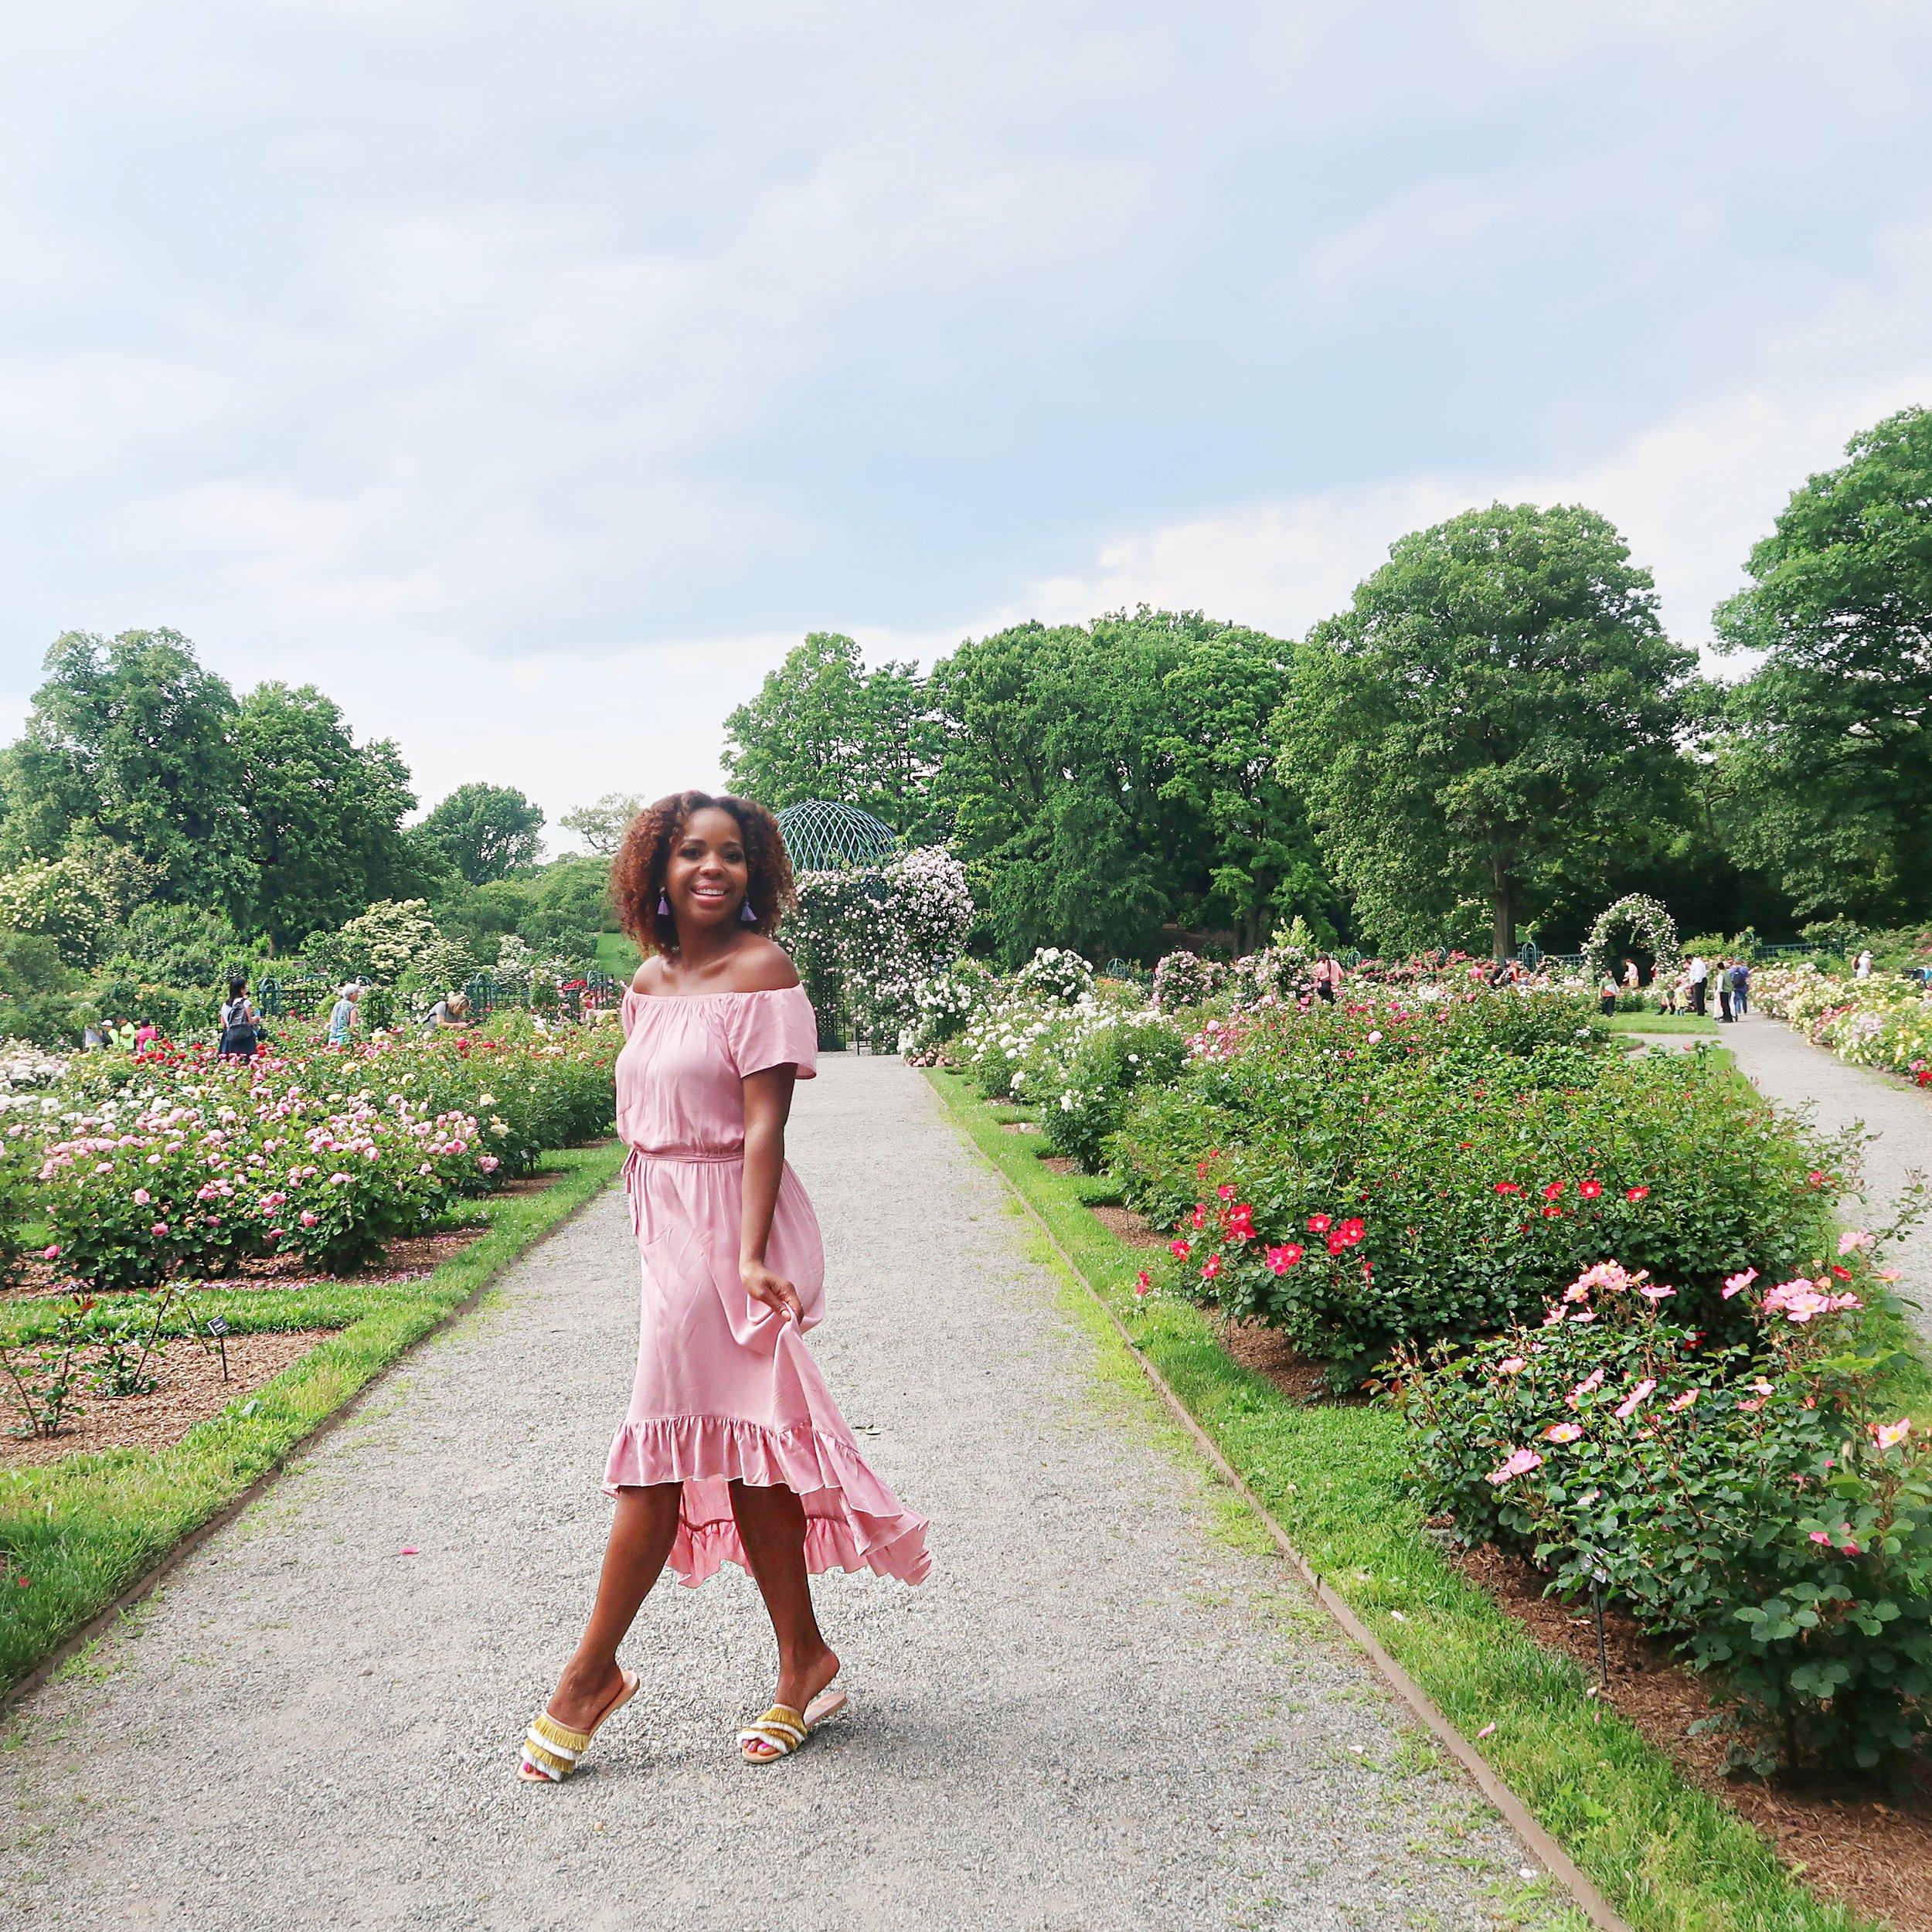 Rose garden summer style